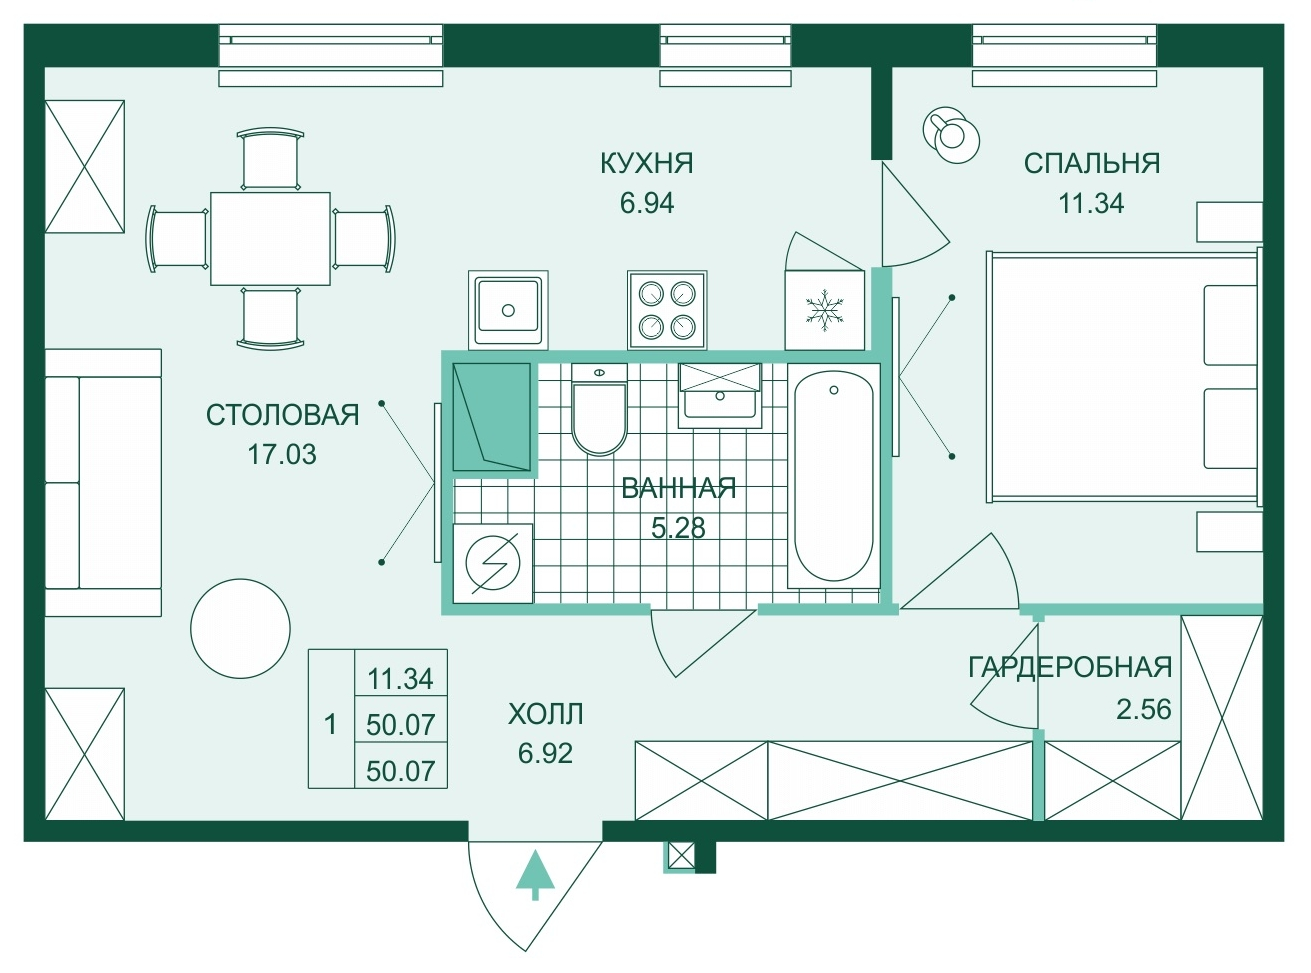 Планировка Двухкомнатная квартира (Евро) площадью 50.07 кв.м в ЖК «Skandi Klubb»